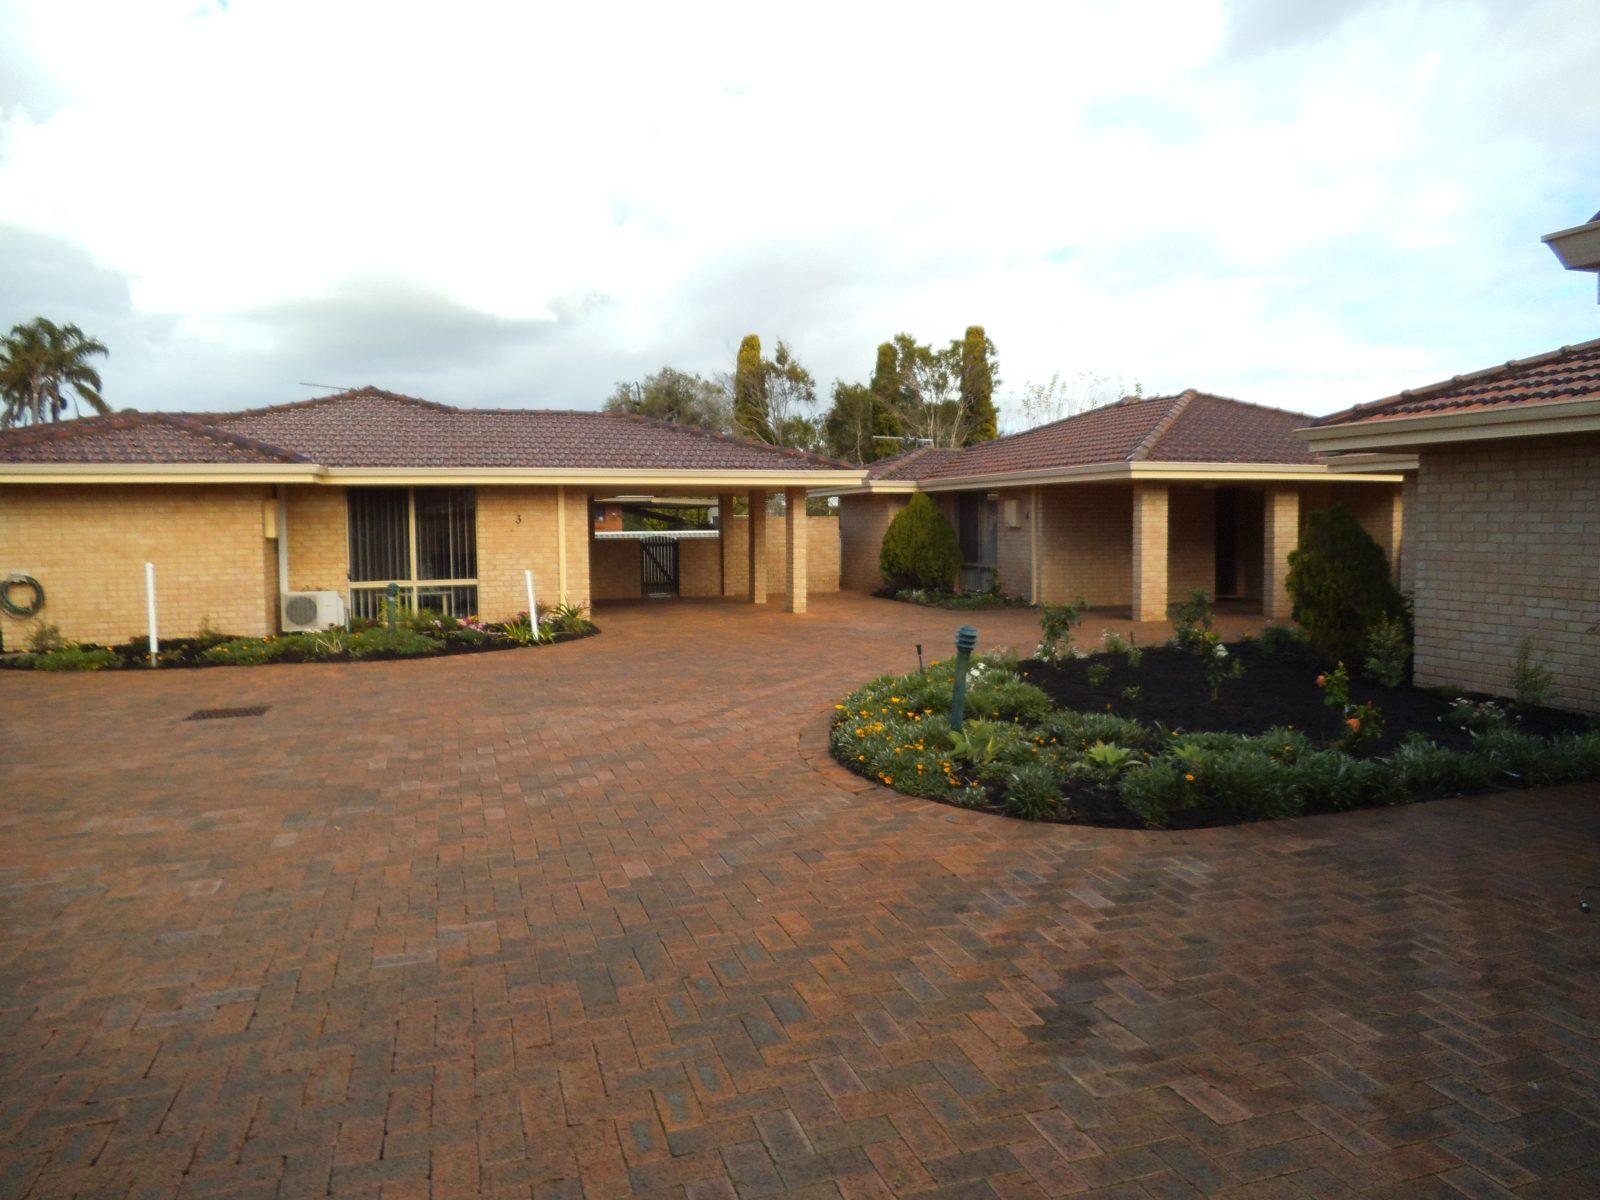 Busselton Holiday Home Unit, Busselton, Western Australia